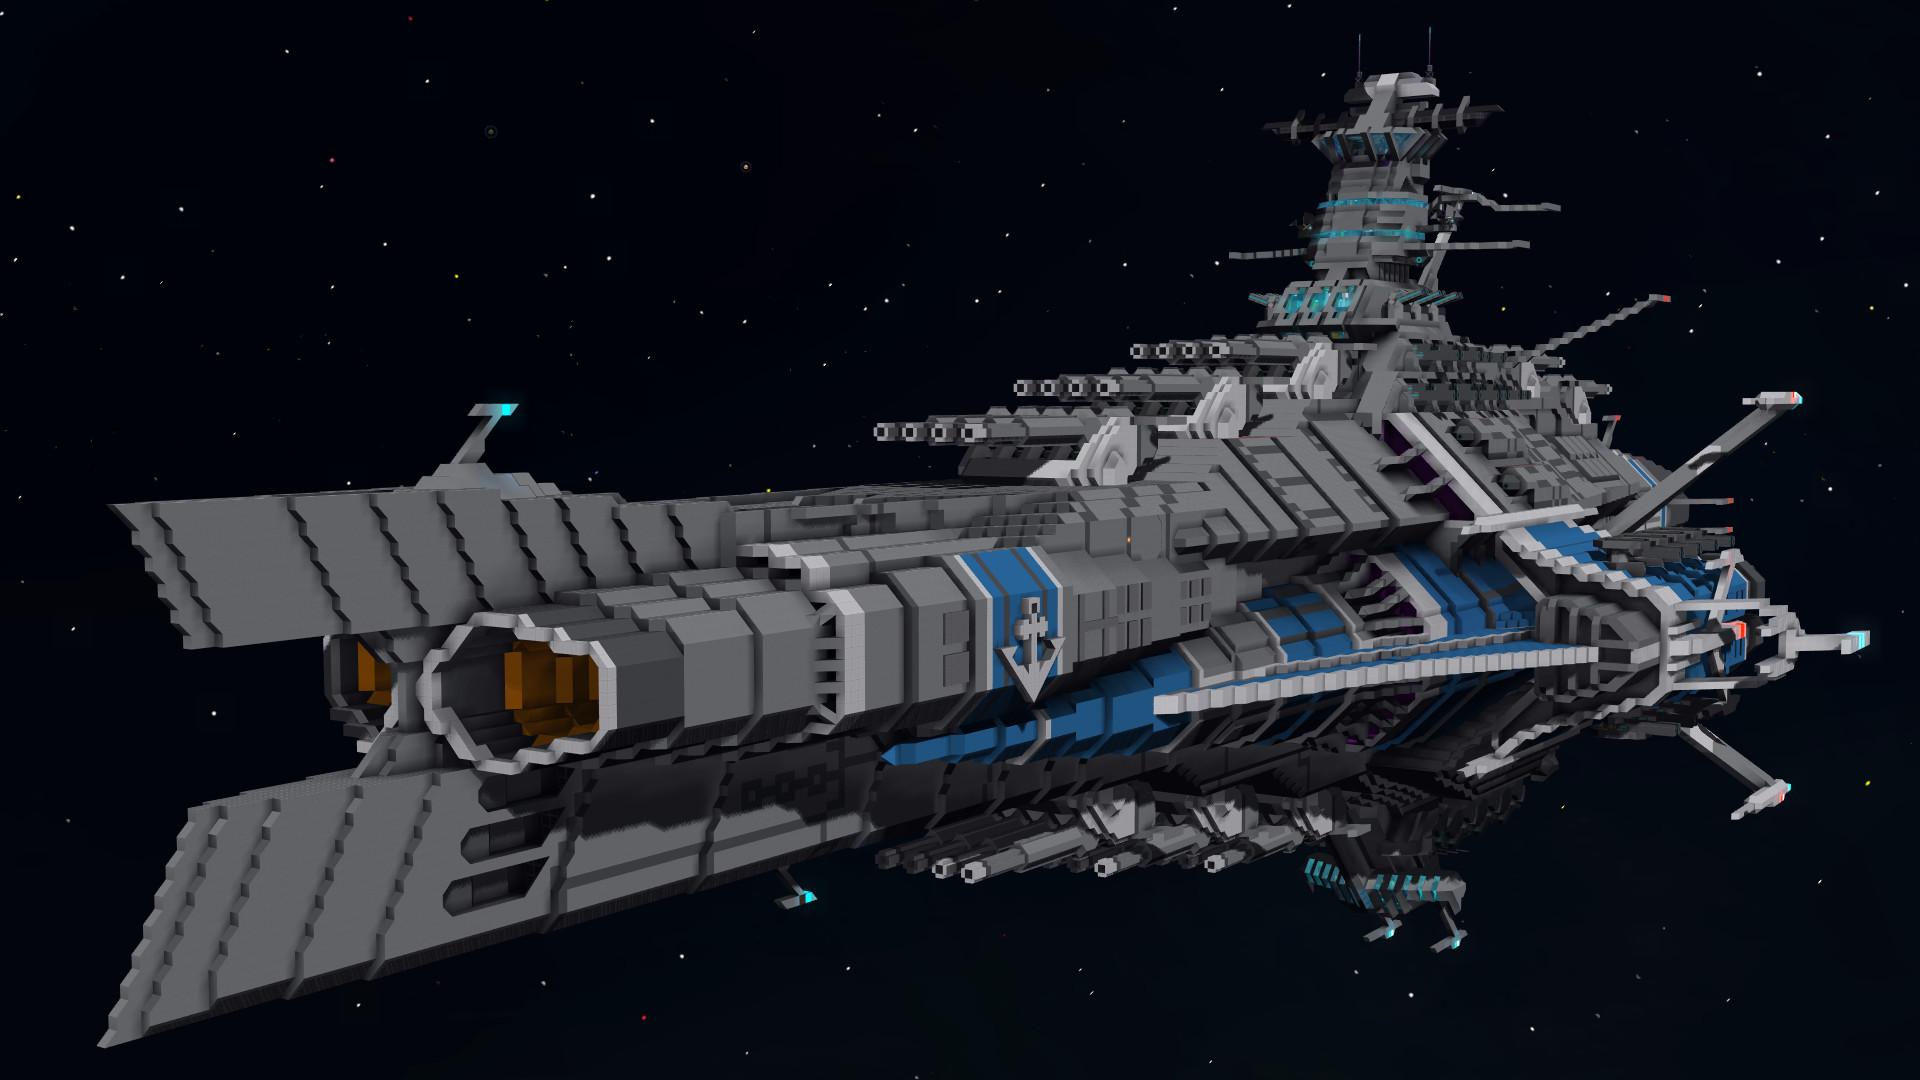 Space Battleship Yamato Wallpaper 86 Images